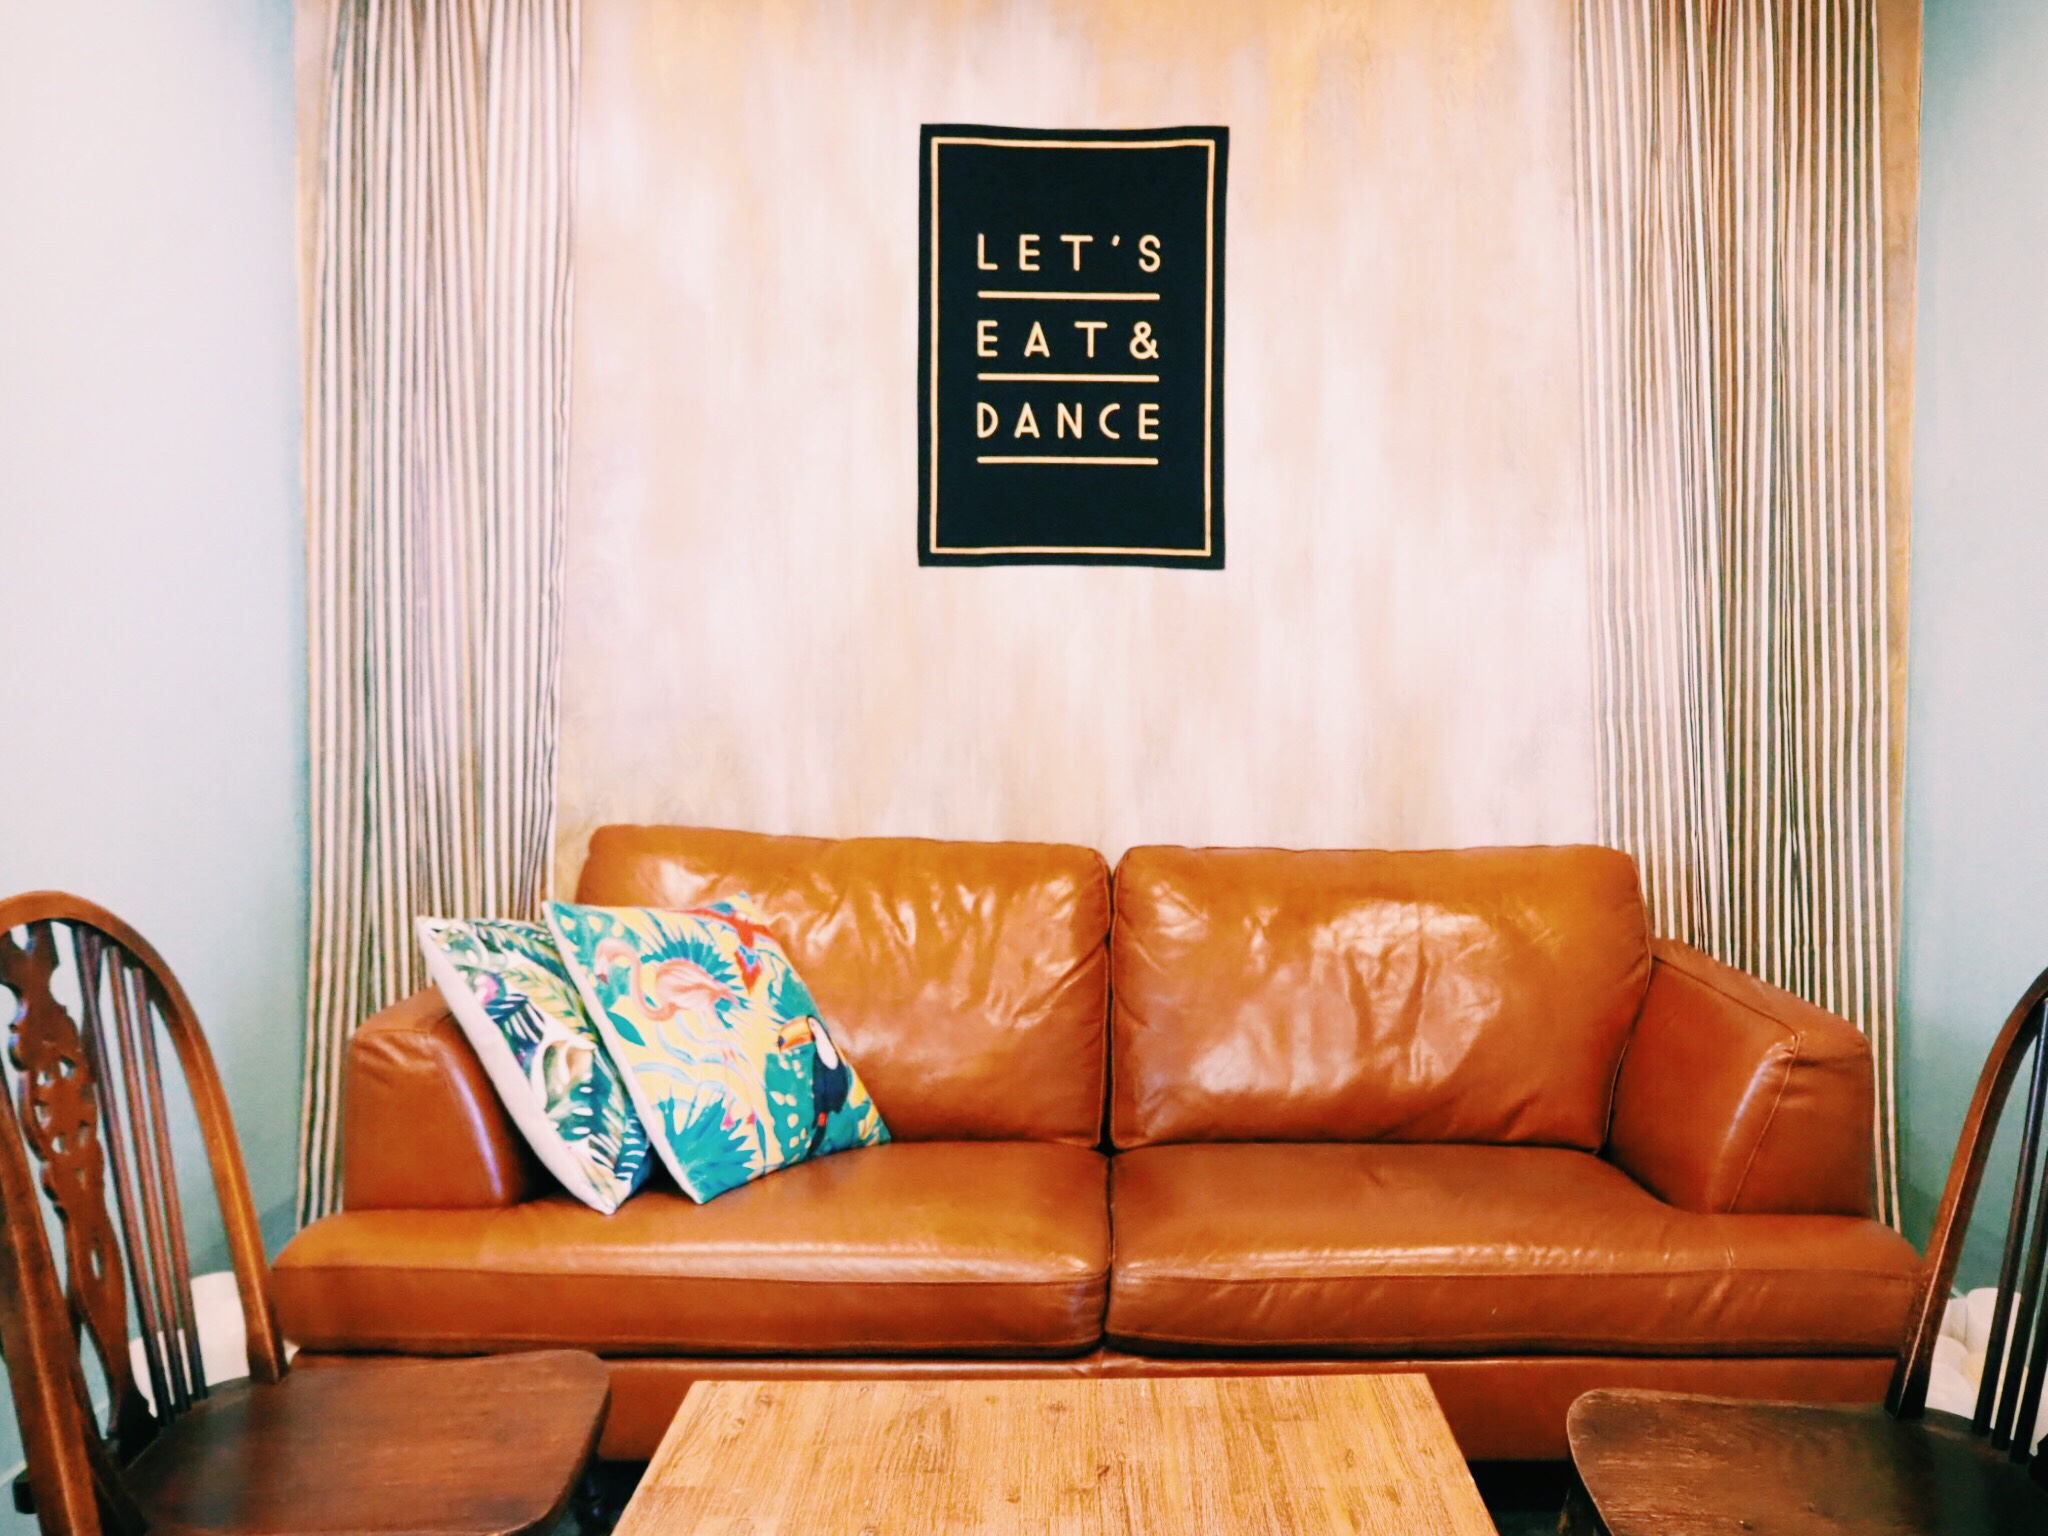 96d38970 0a5a 417e b9b4 4b5945d0ea03 - GRAND MUSE - まるで隠れ家一軒家。韓国ソウルにオープンしたケーキプレートがおしゃれなカフェ